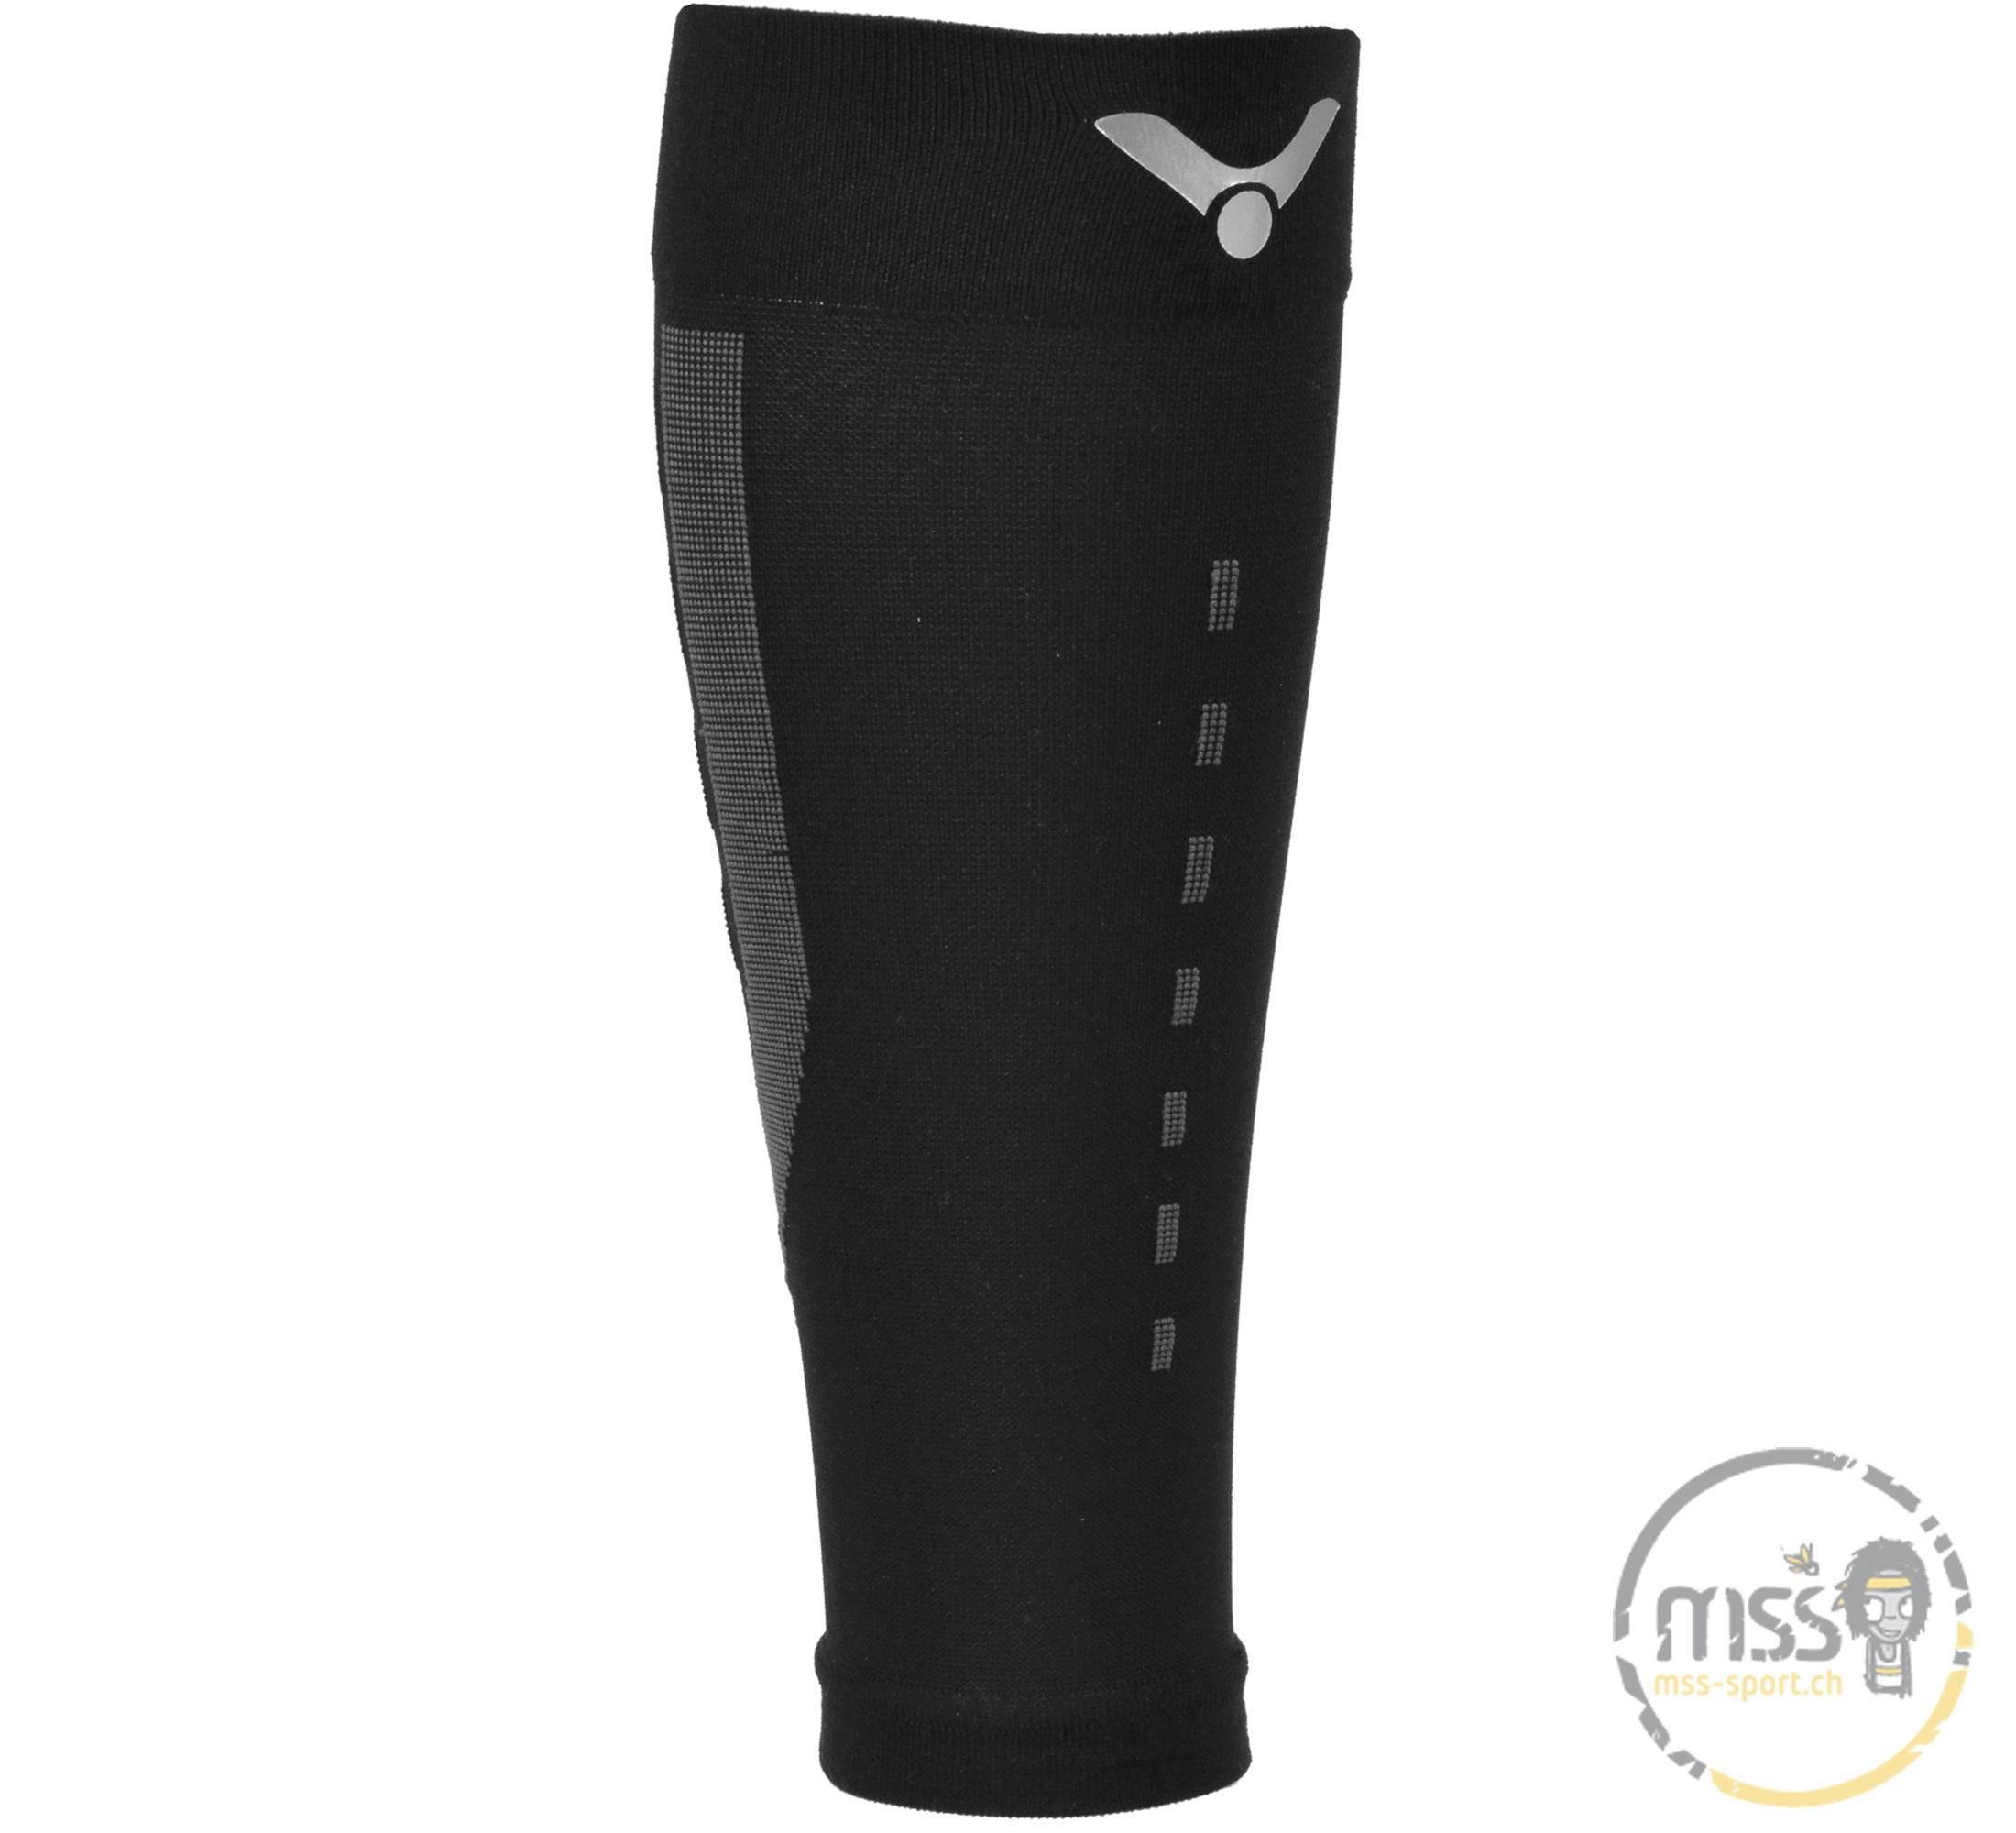 Victor Compression Calf Sleeves black